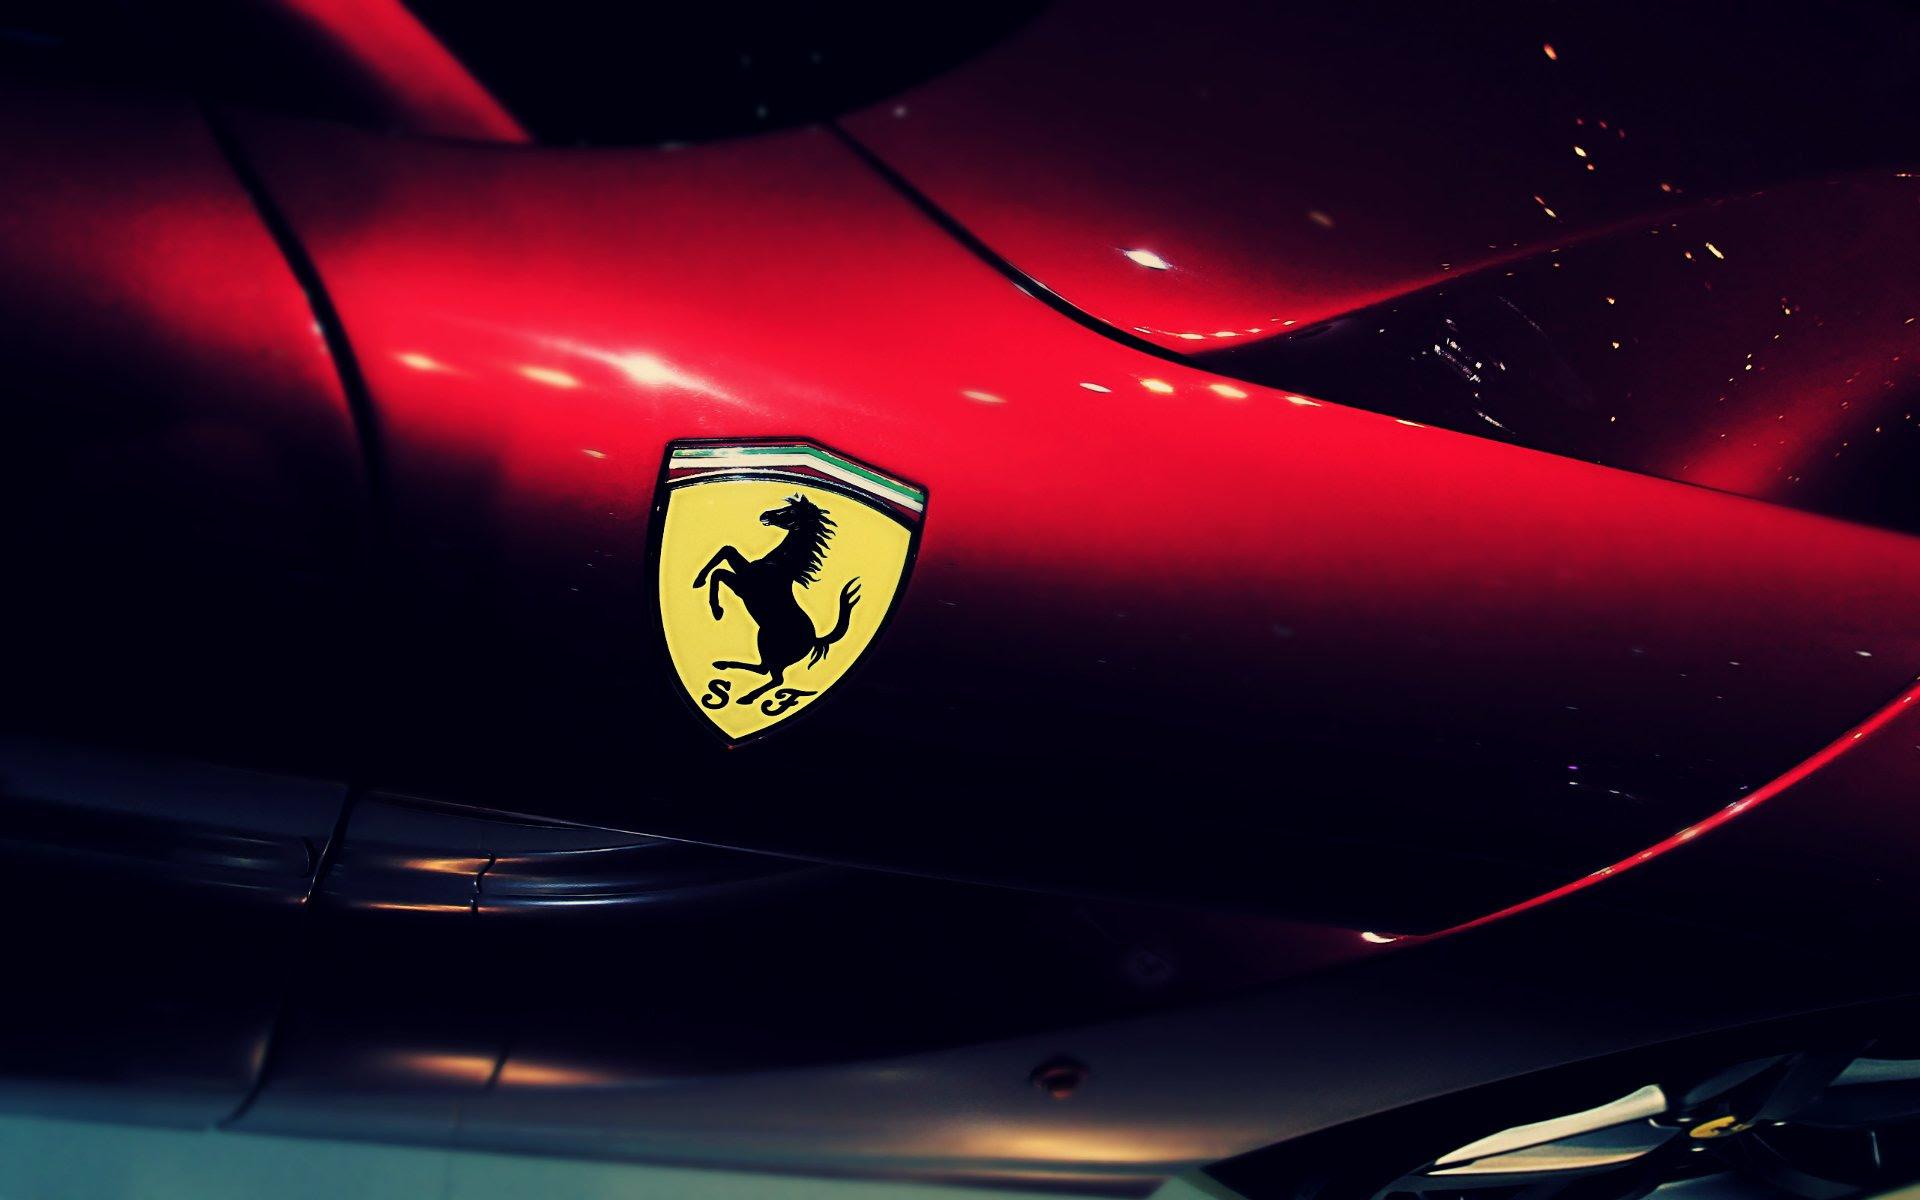 Ferrari On Hd Wallpapers Backgrounds For Desktop Coolest